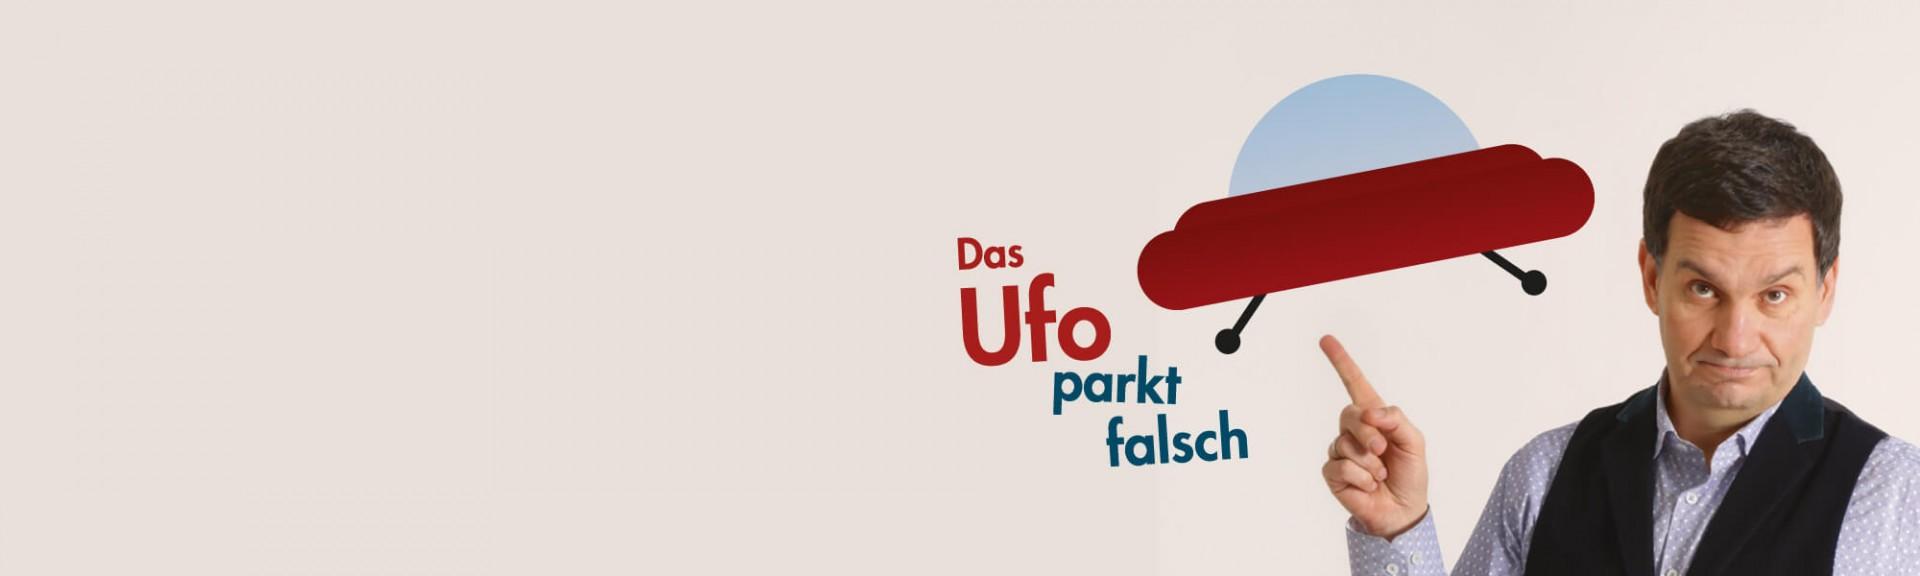 Das Ufo parkt falsch